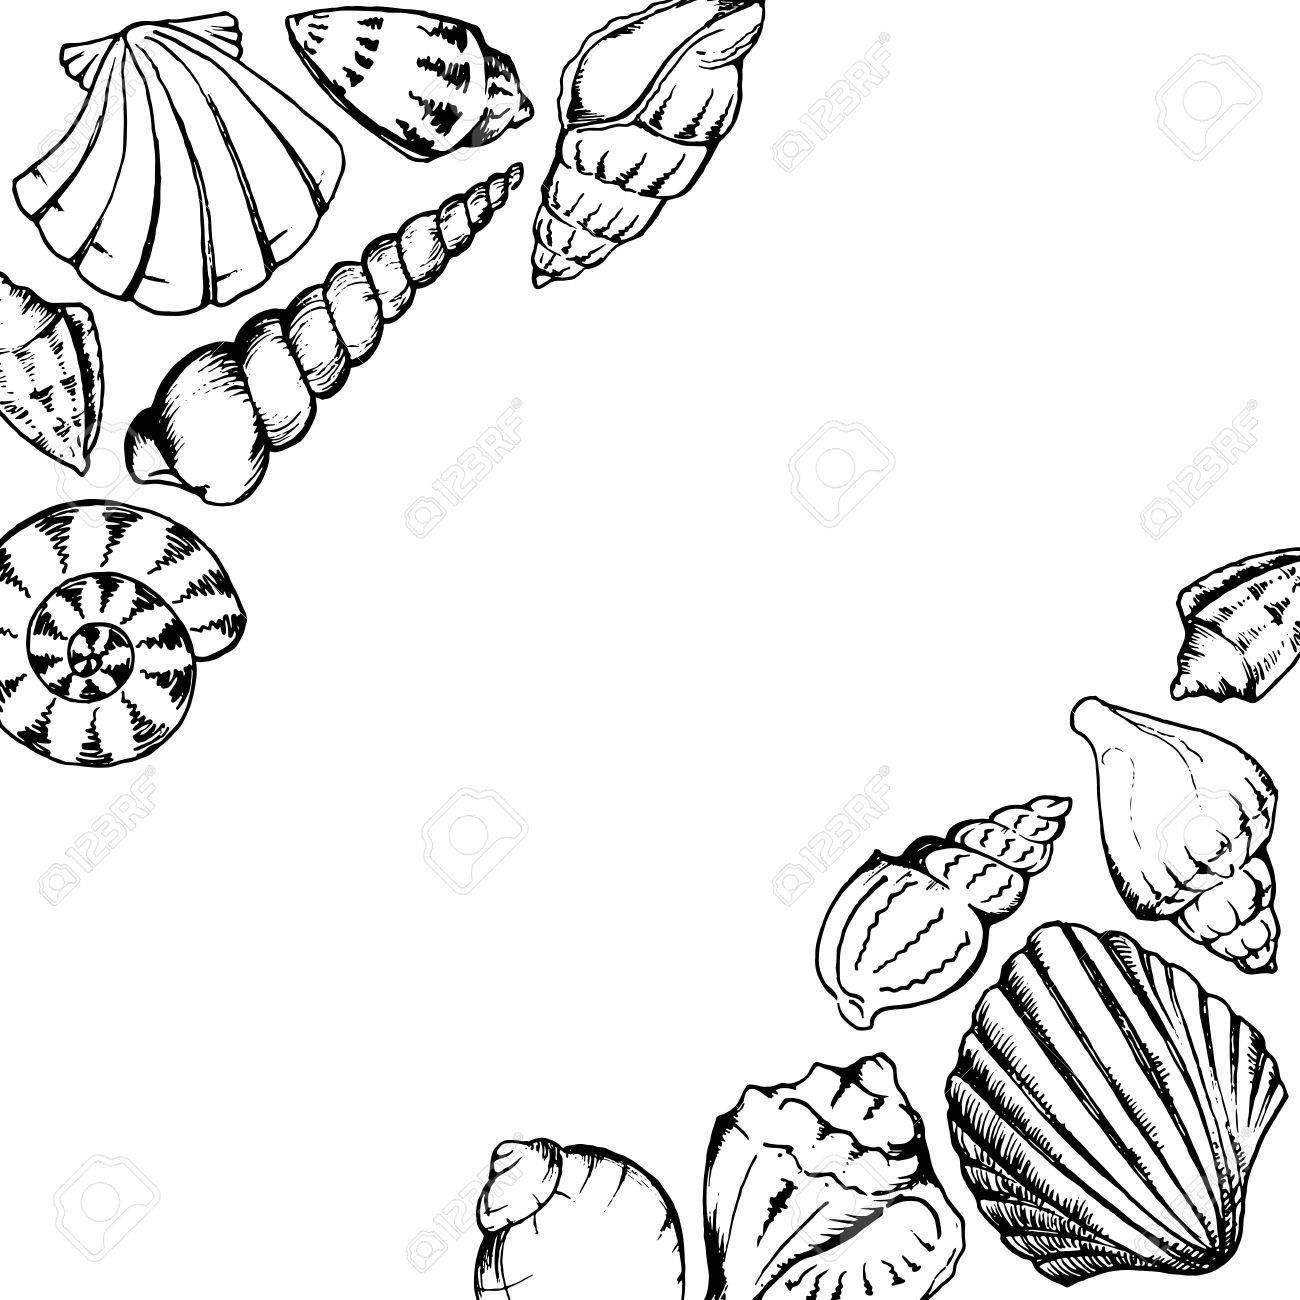 1300x1300 Monochrome Sea Shells Line Art Hand Drawn Frame Vector Isolated